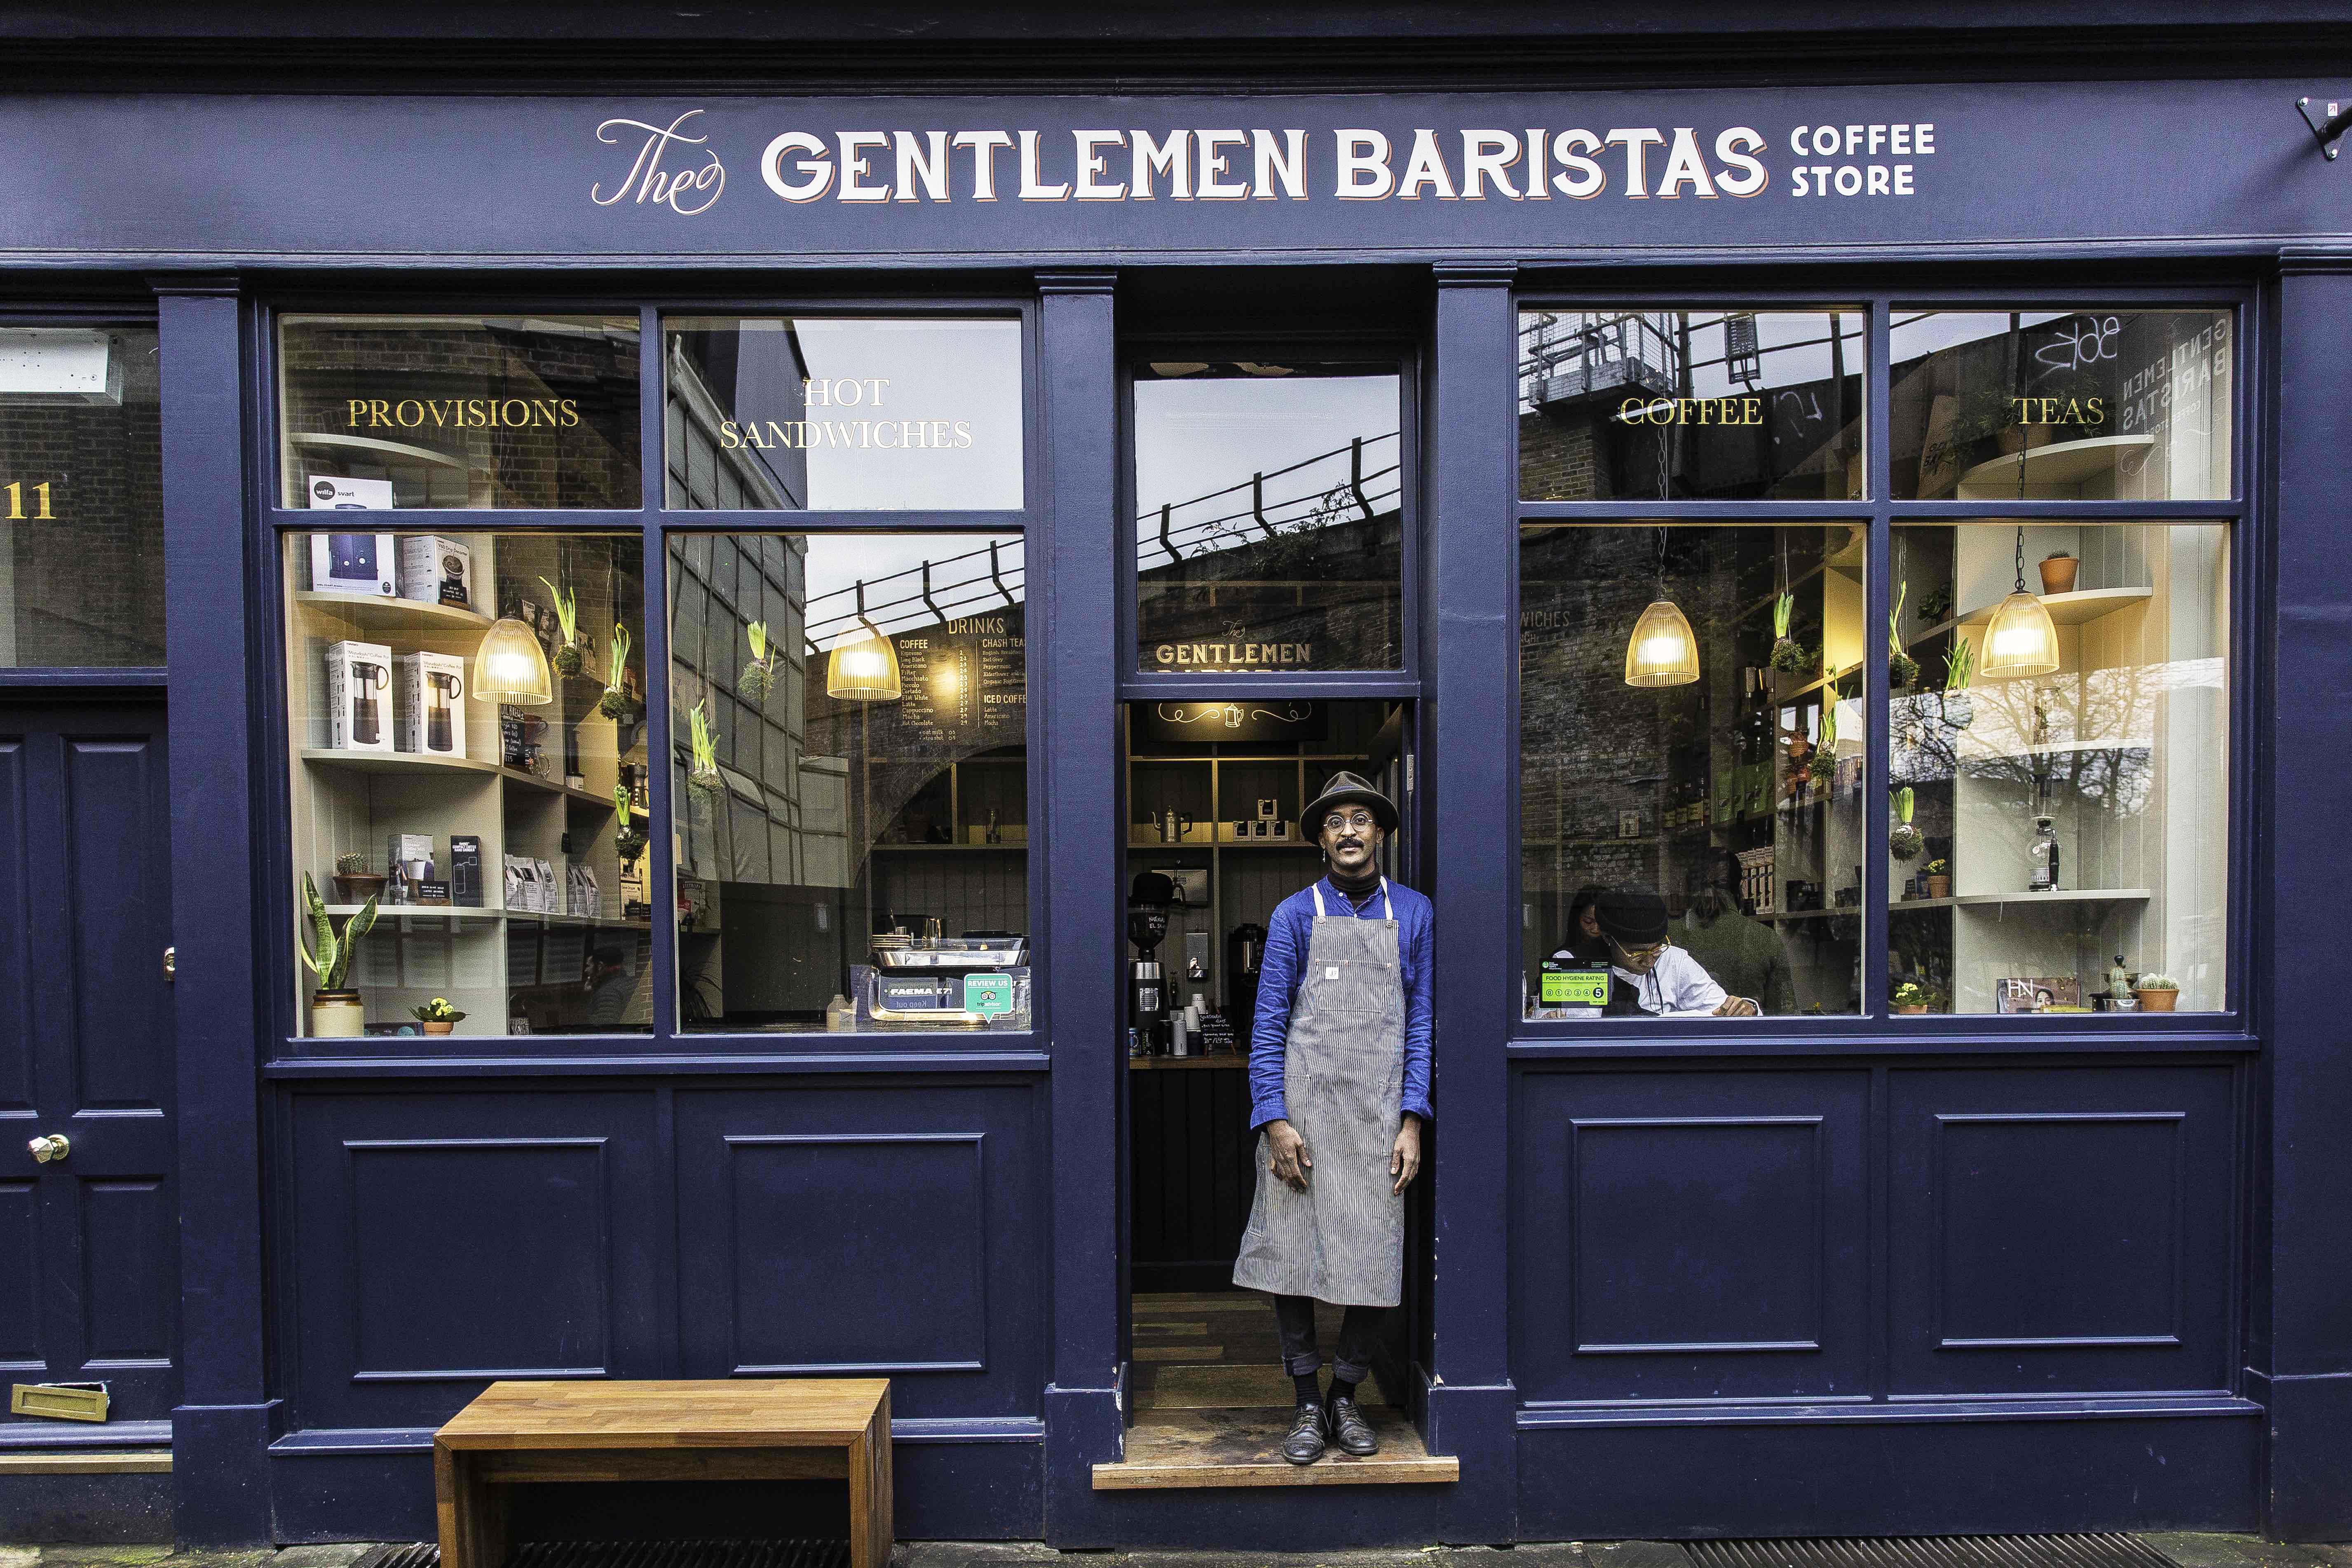 TheGentlemenBaristas free coffee